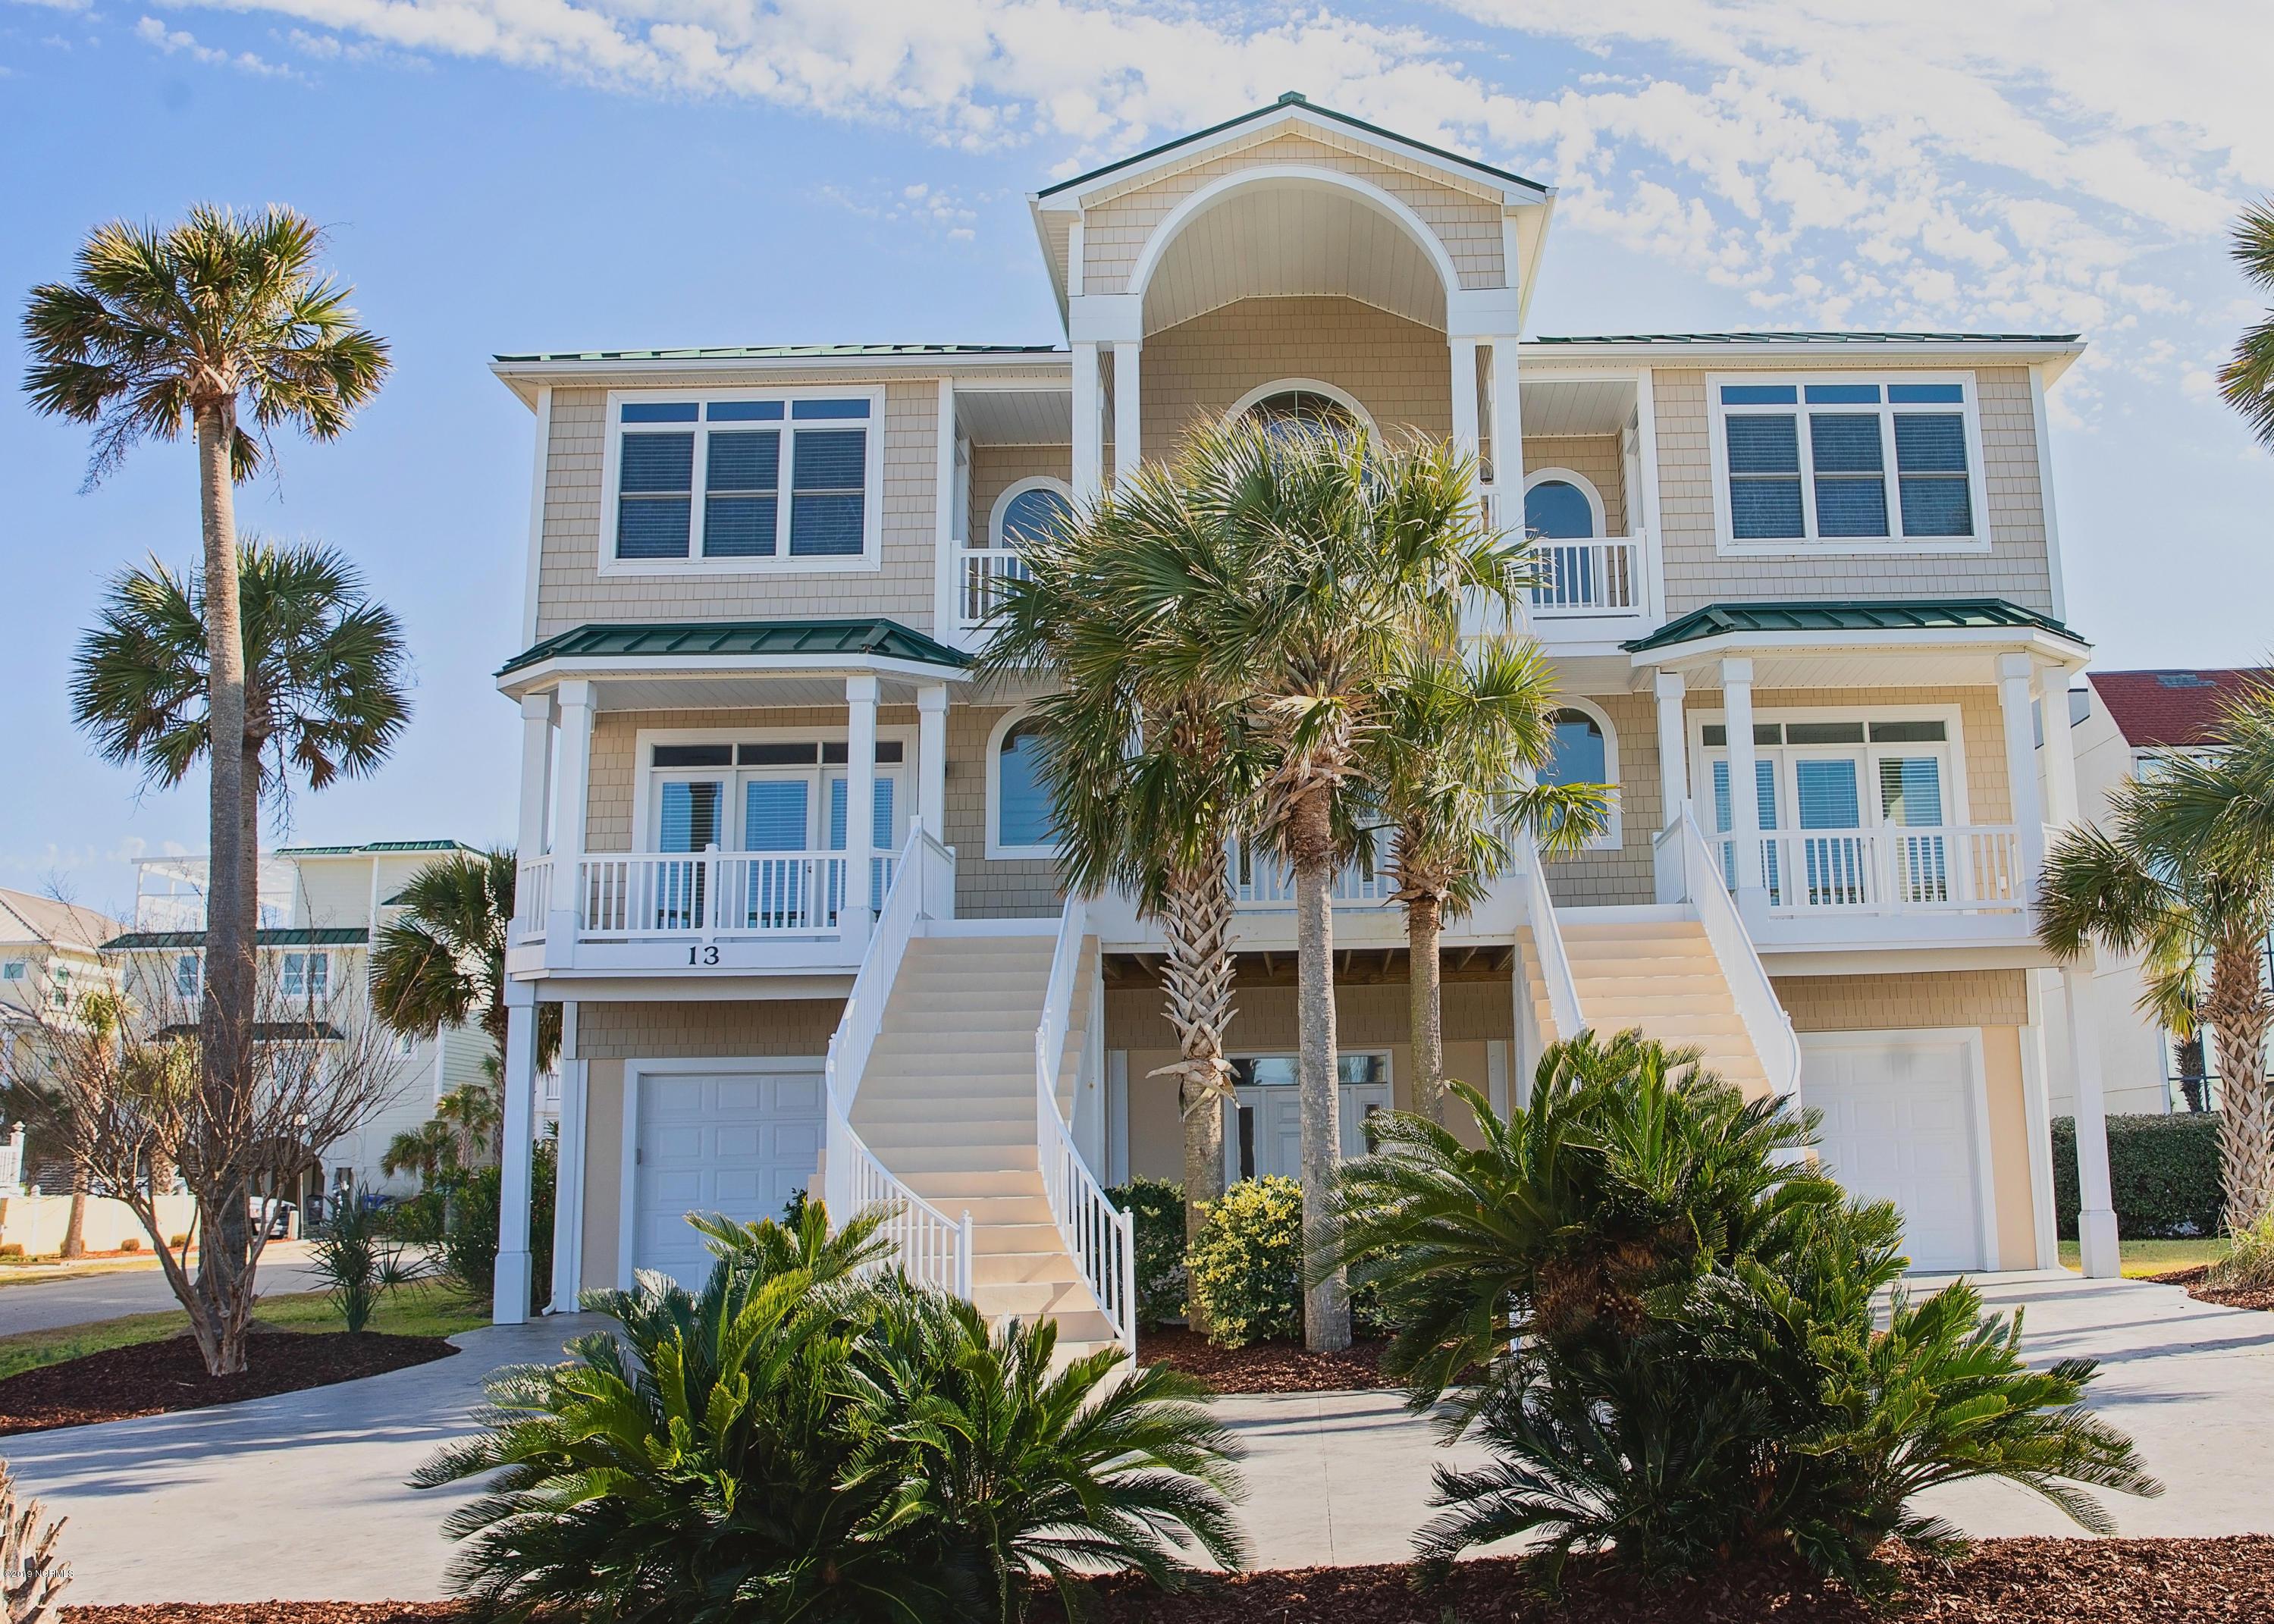 Groovy Ocean Isle Beach Homes For Sale Ocean Isle Beach North Interior Design Ideas Philsoteloinfo